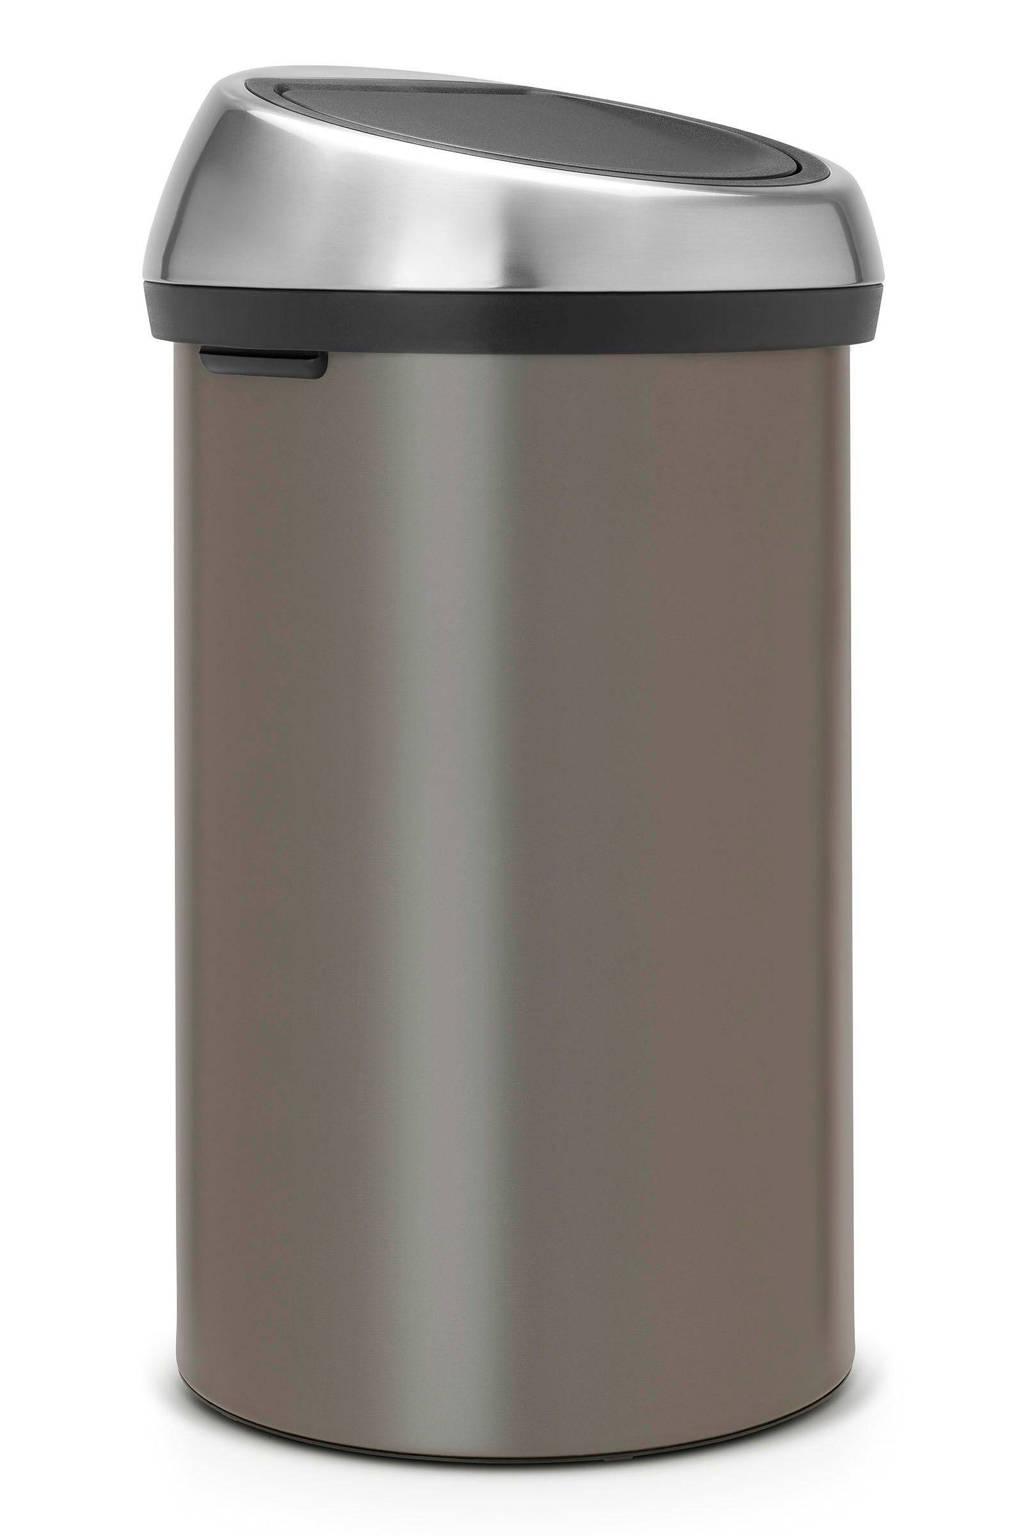 Brabantia Afvalemmer Touch Bin Flat Top.Brabantia Touch Bin 60 Liter Prullenbak Wehkamp